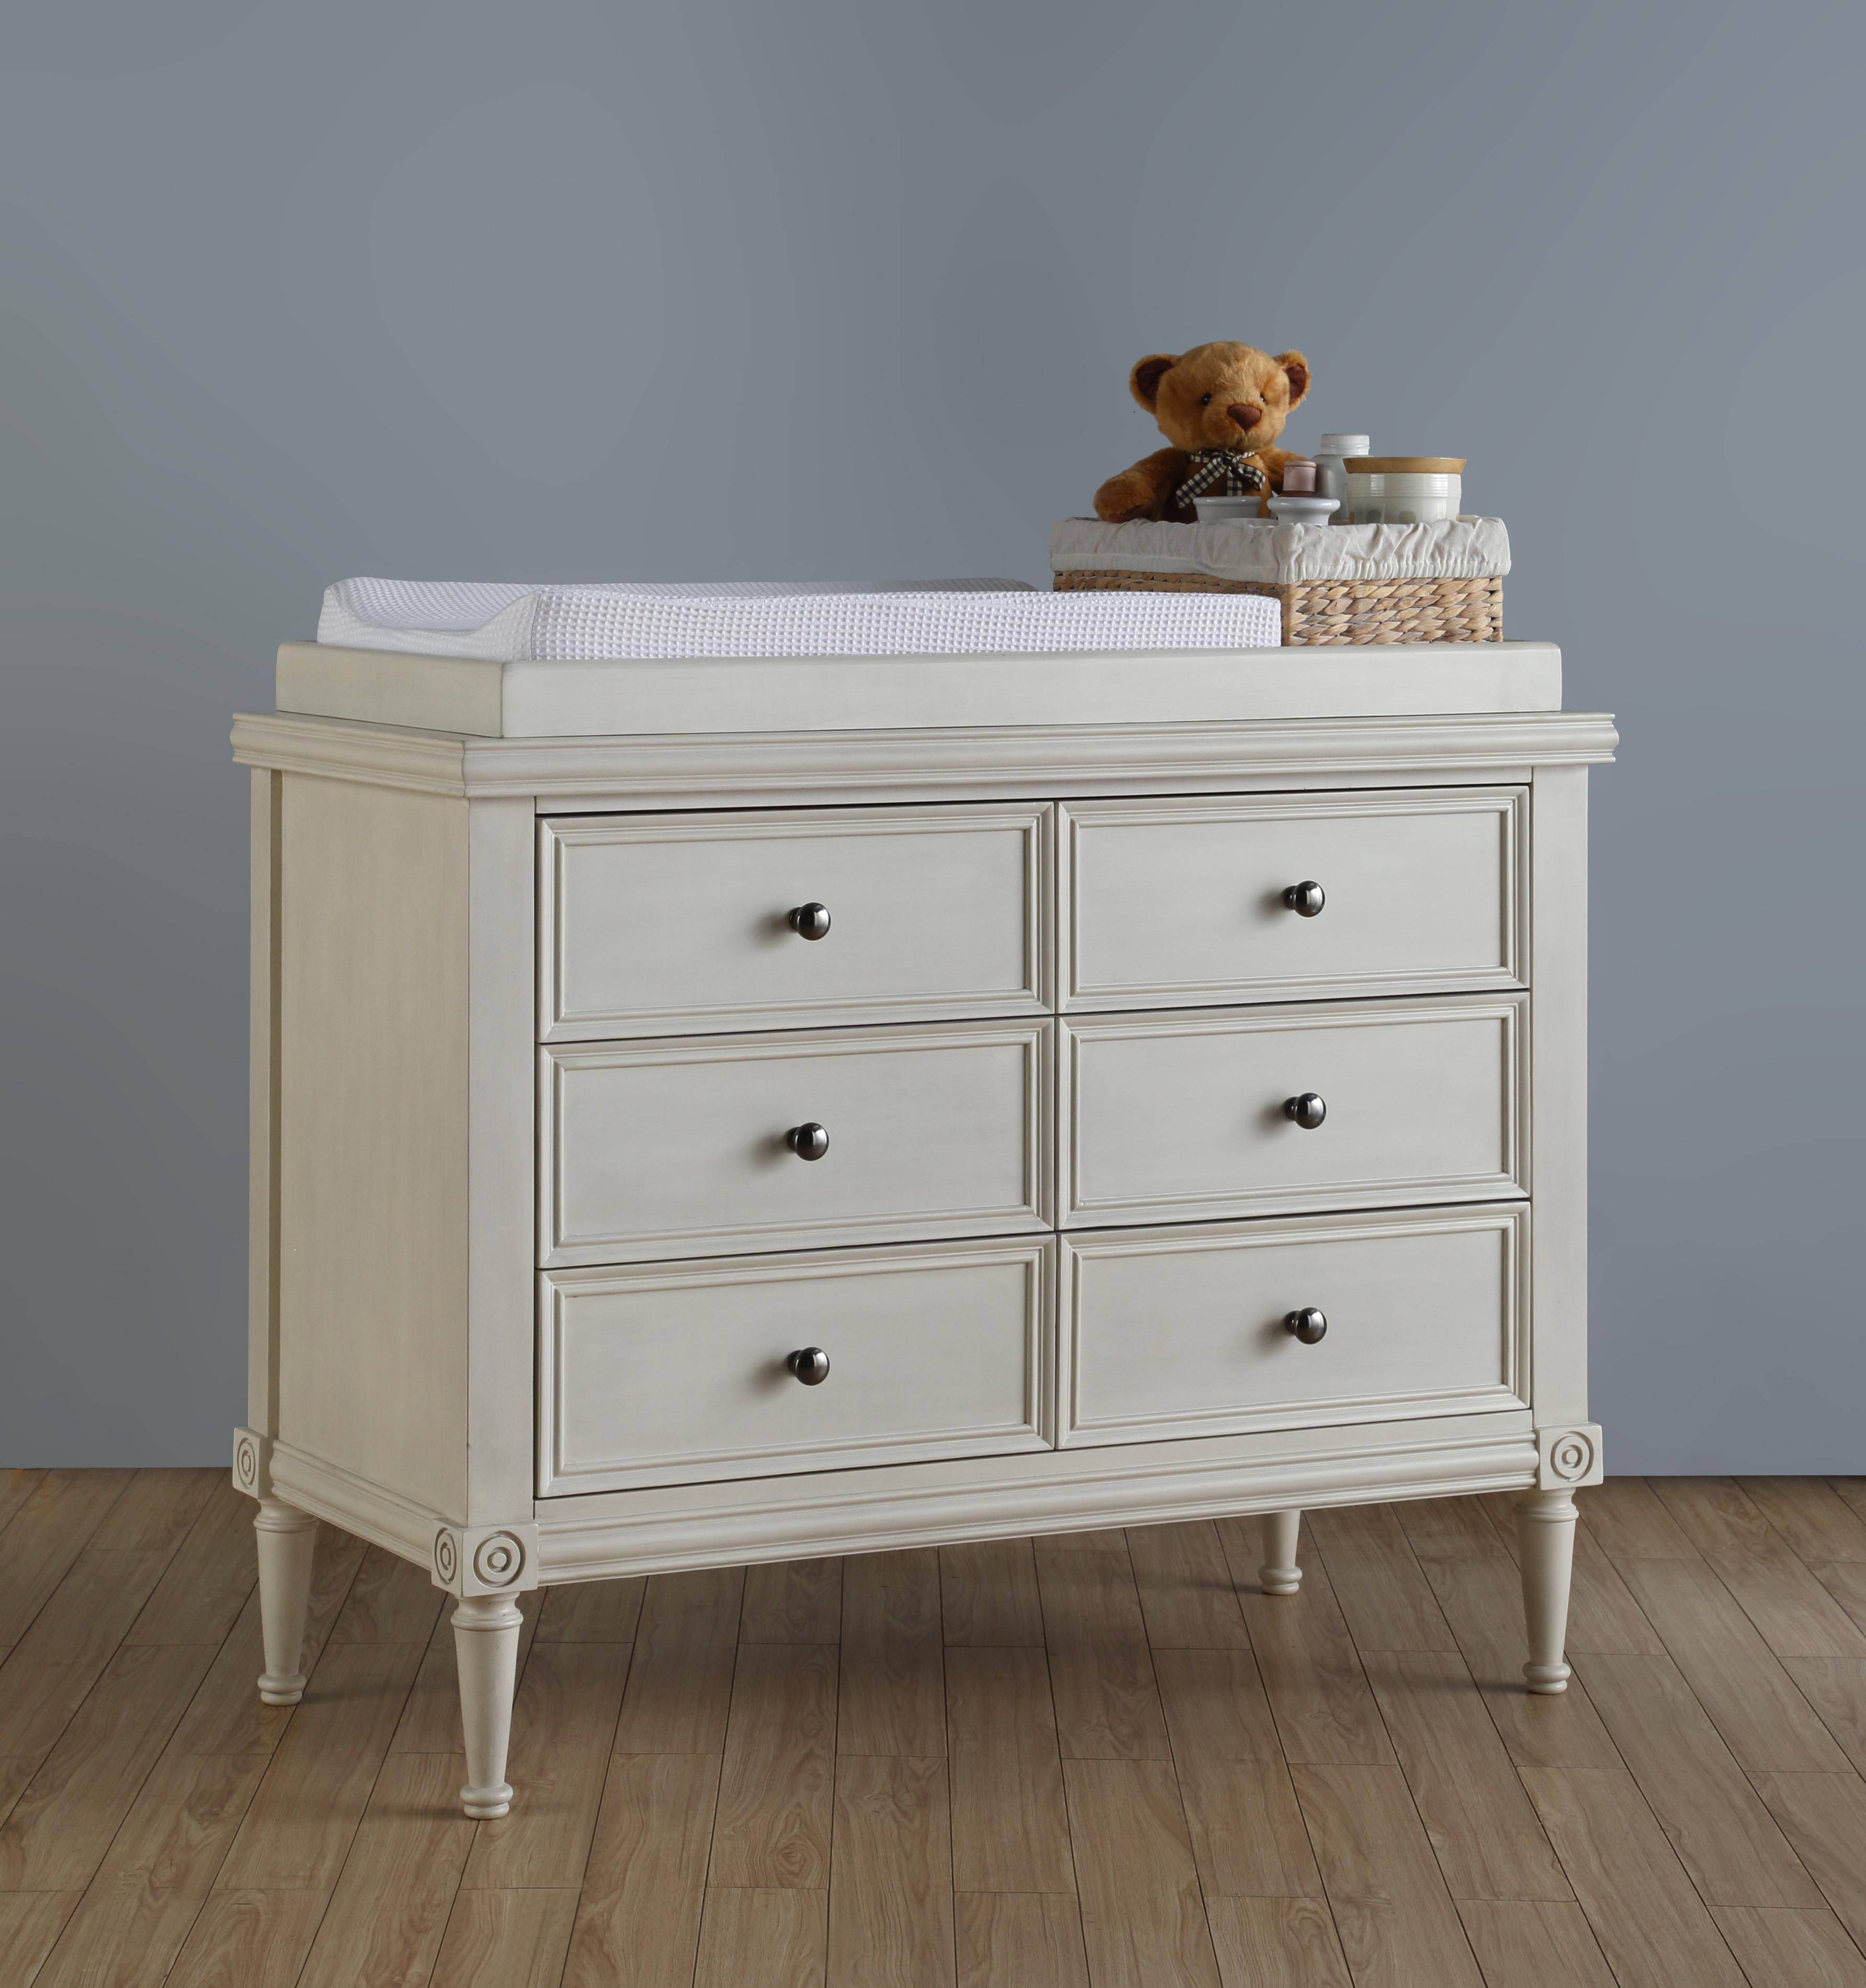 Teddyone - Windsor Dresser